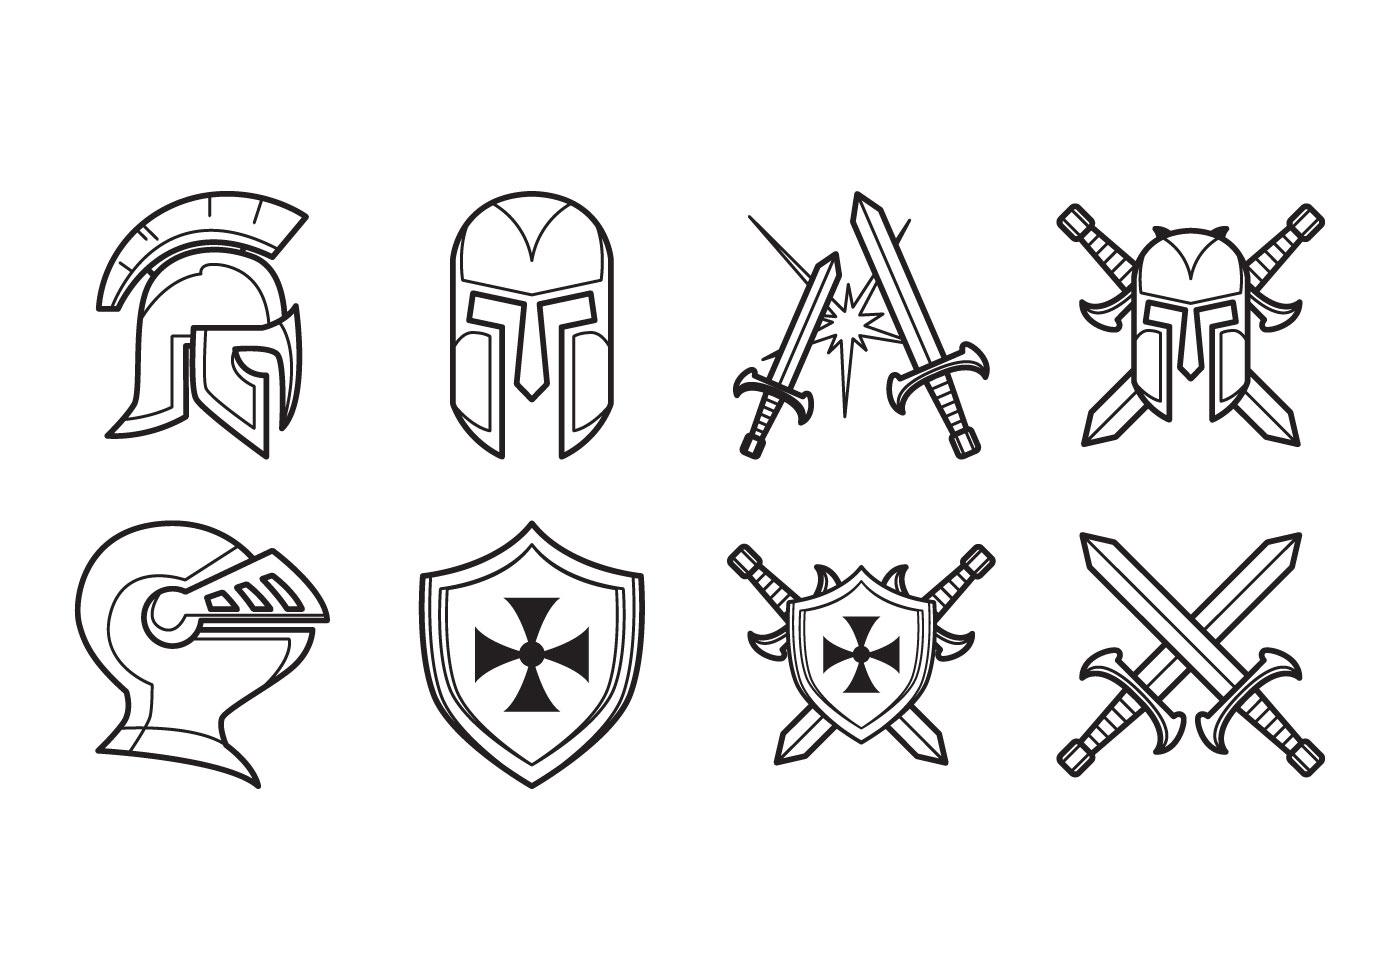 Medieval Helmet Free Vector Art - (1436 Free Downloads)